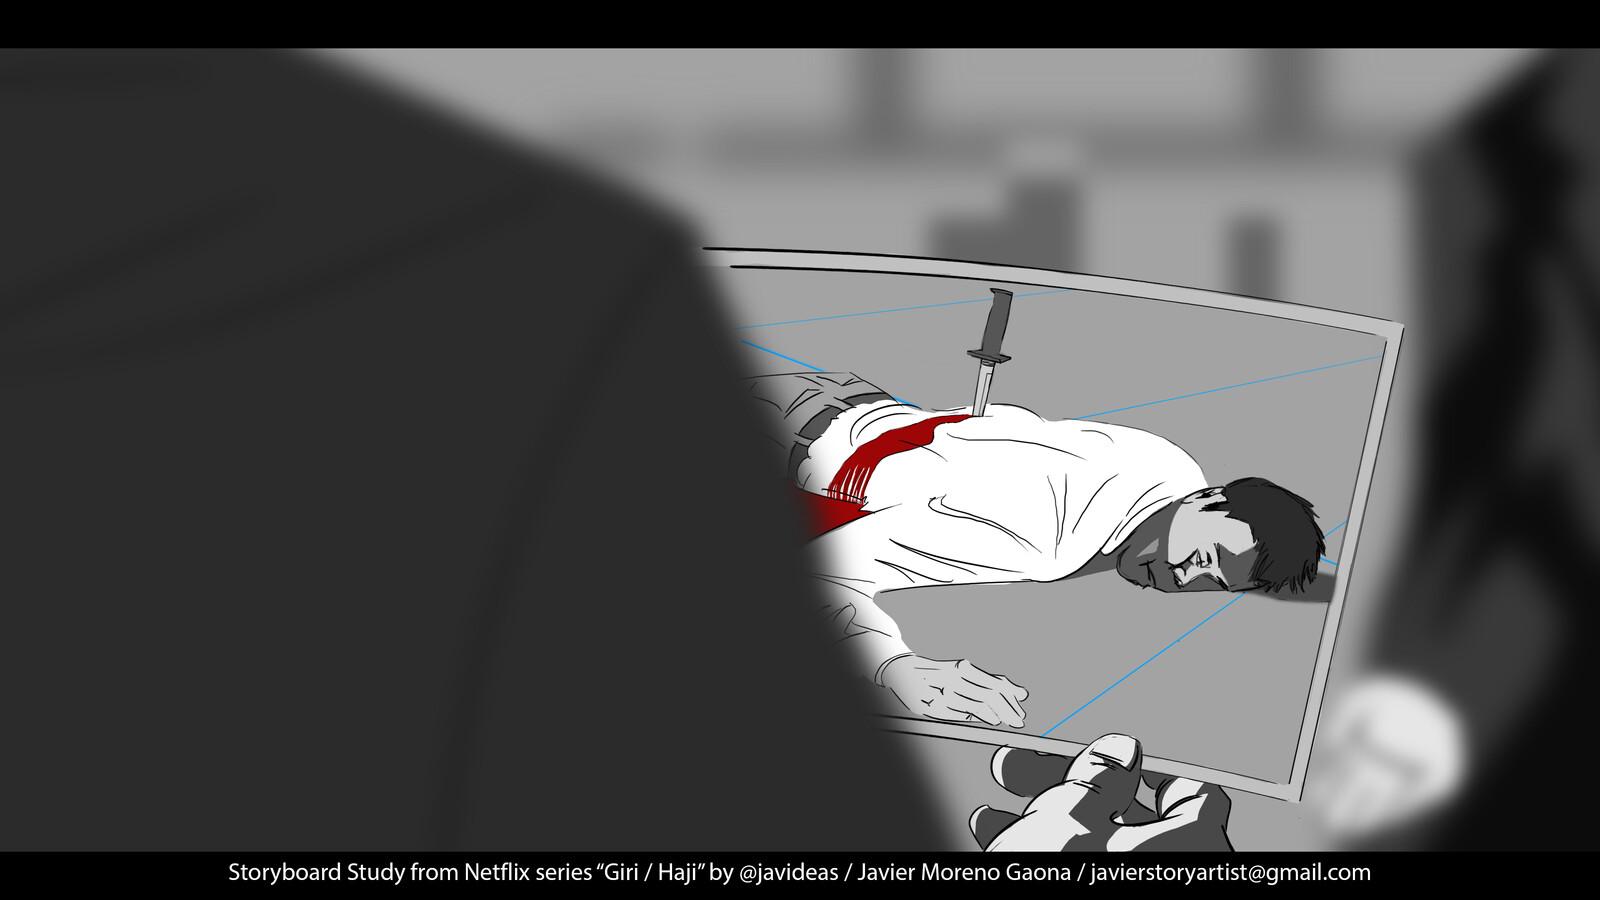 Storyboard & Timelapse Giri / Haji Netflix series